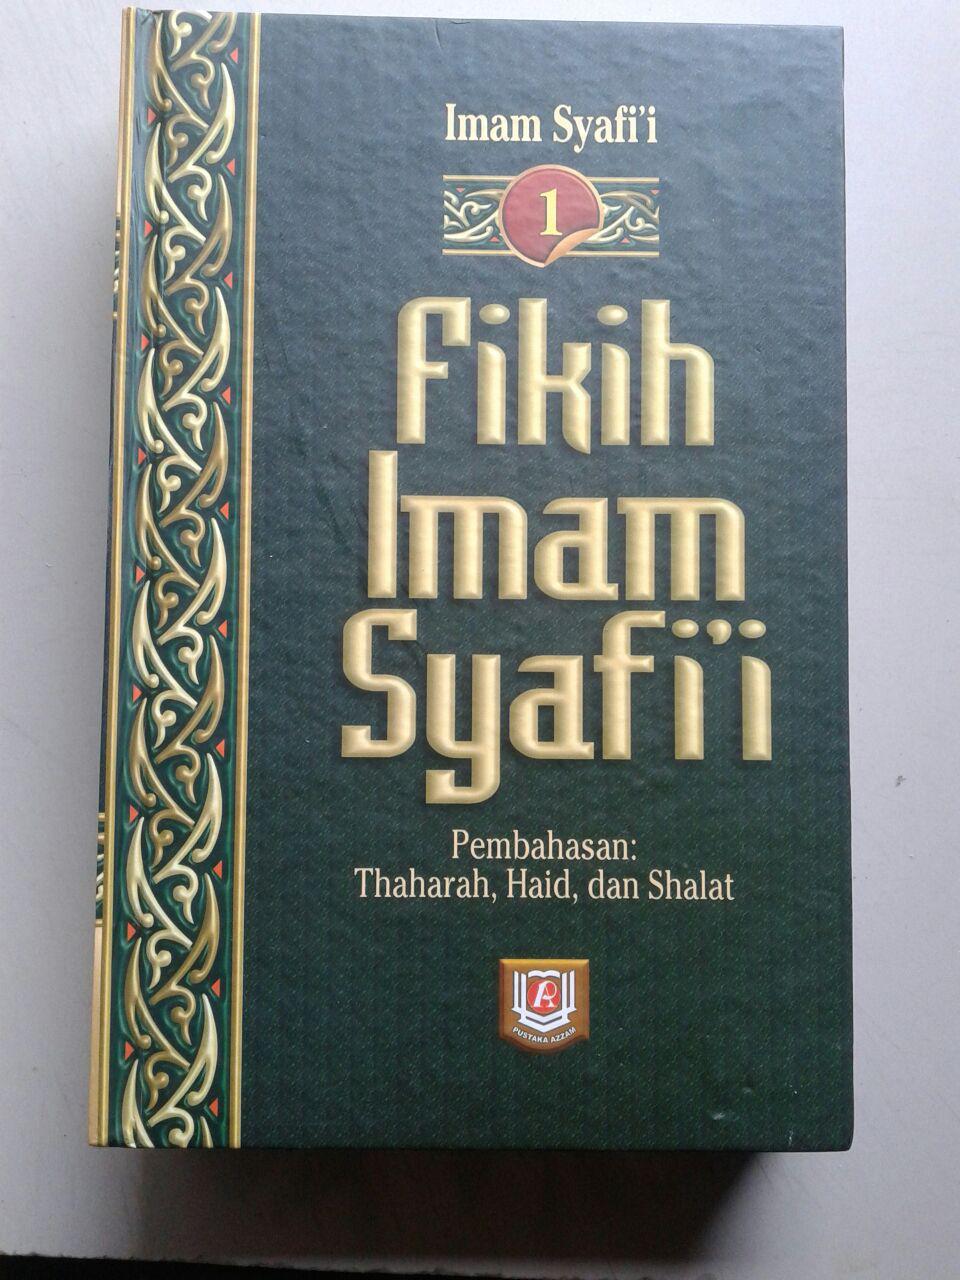 Buku Fikih Imam Syafi'i 1 Set 4 Jilid